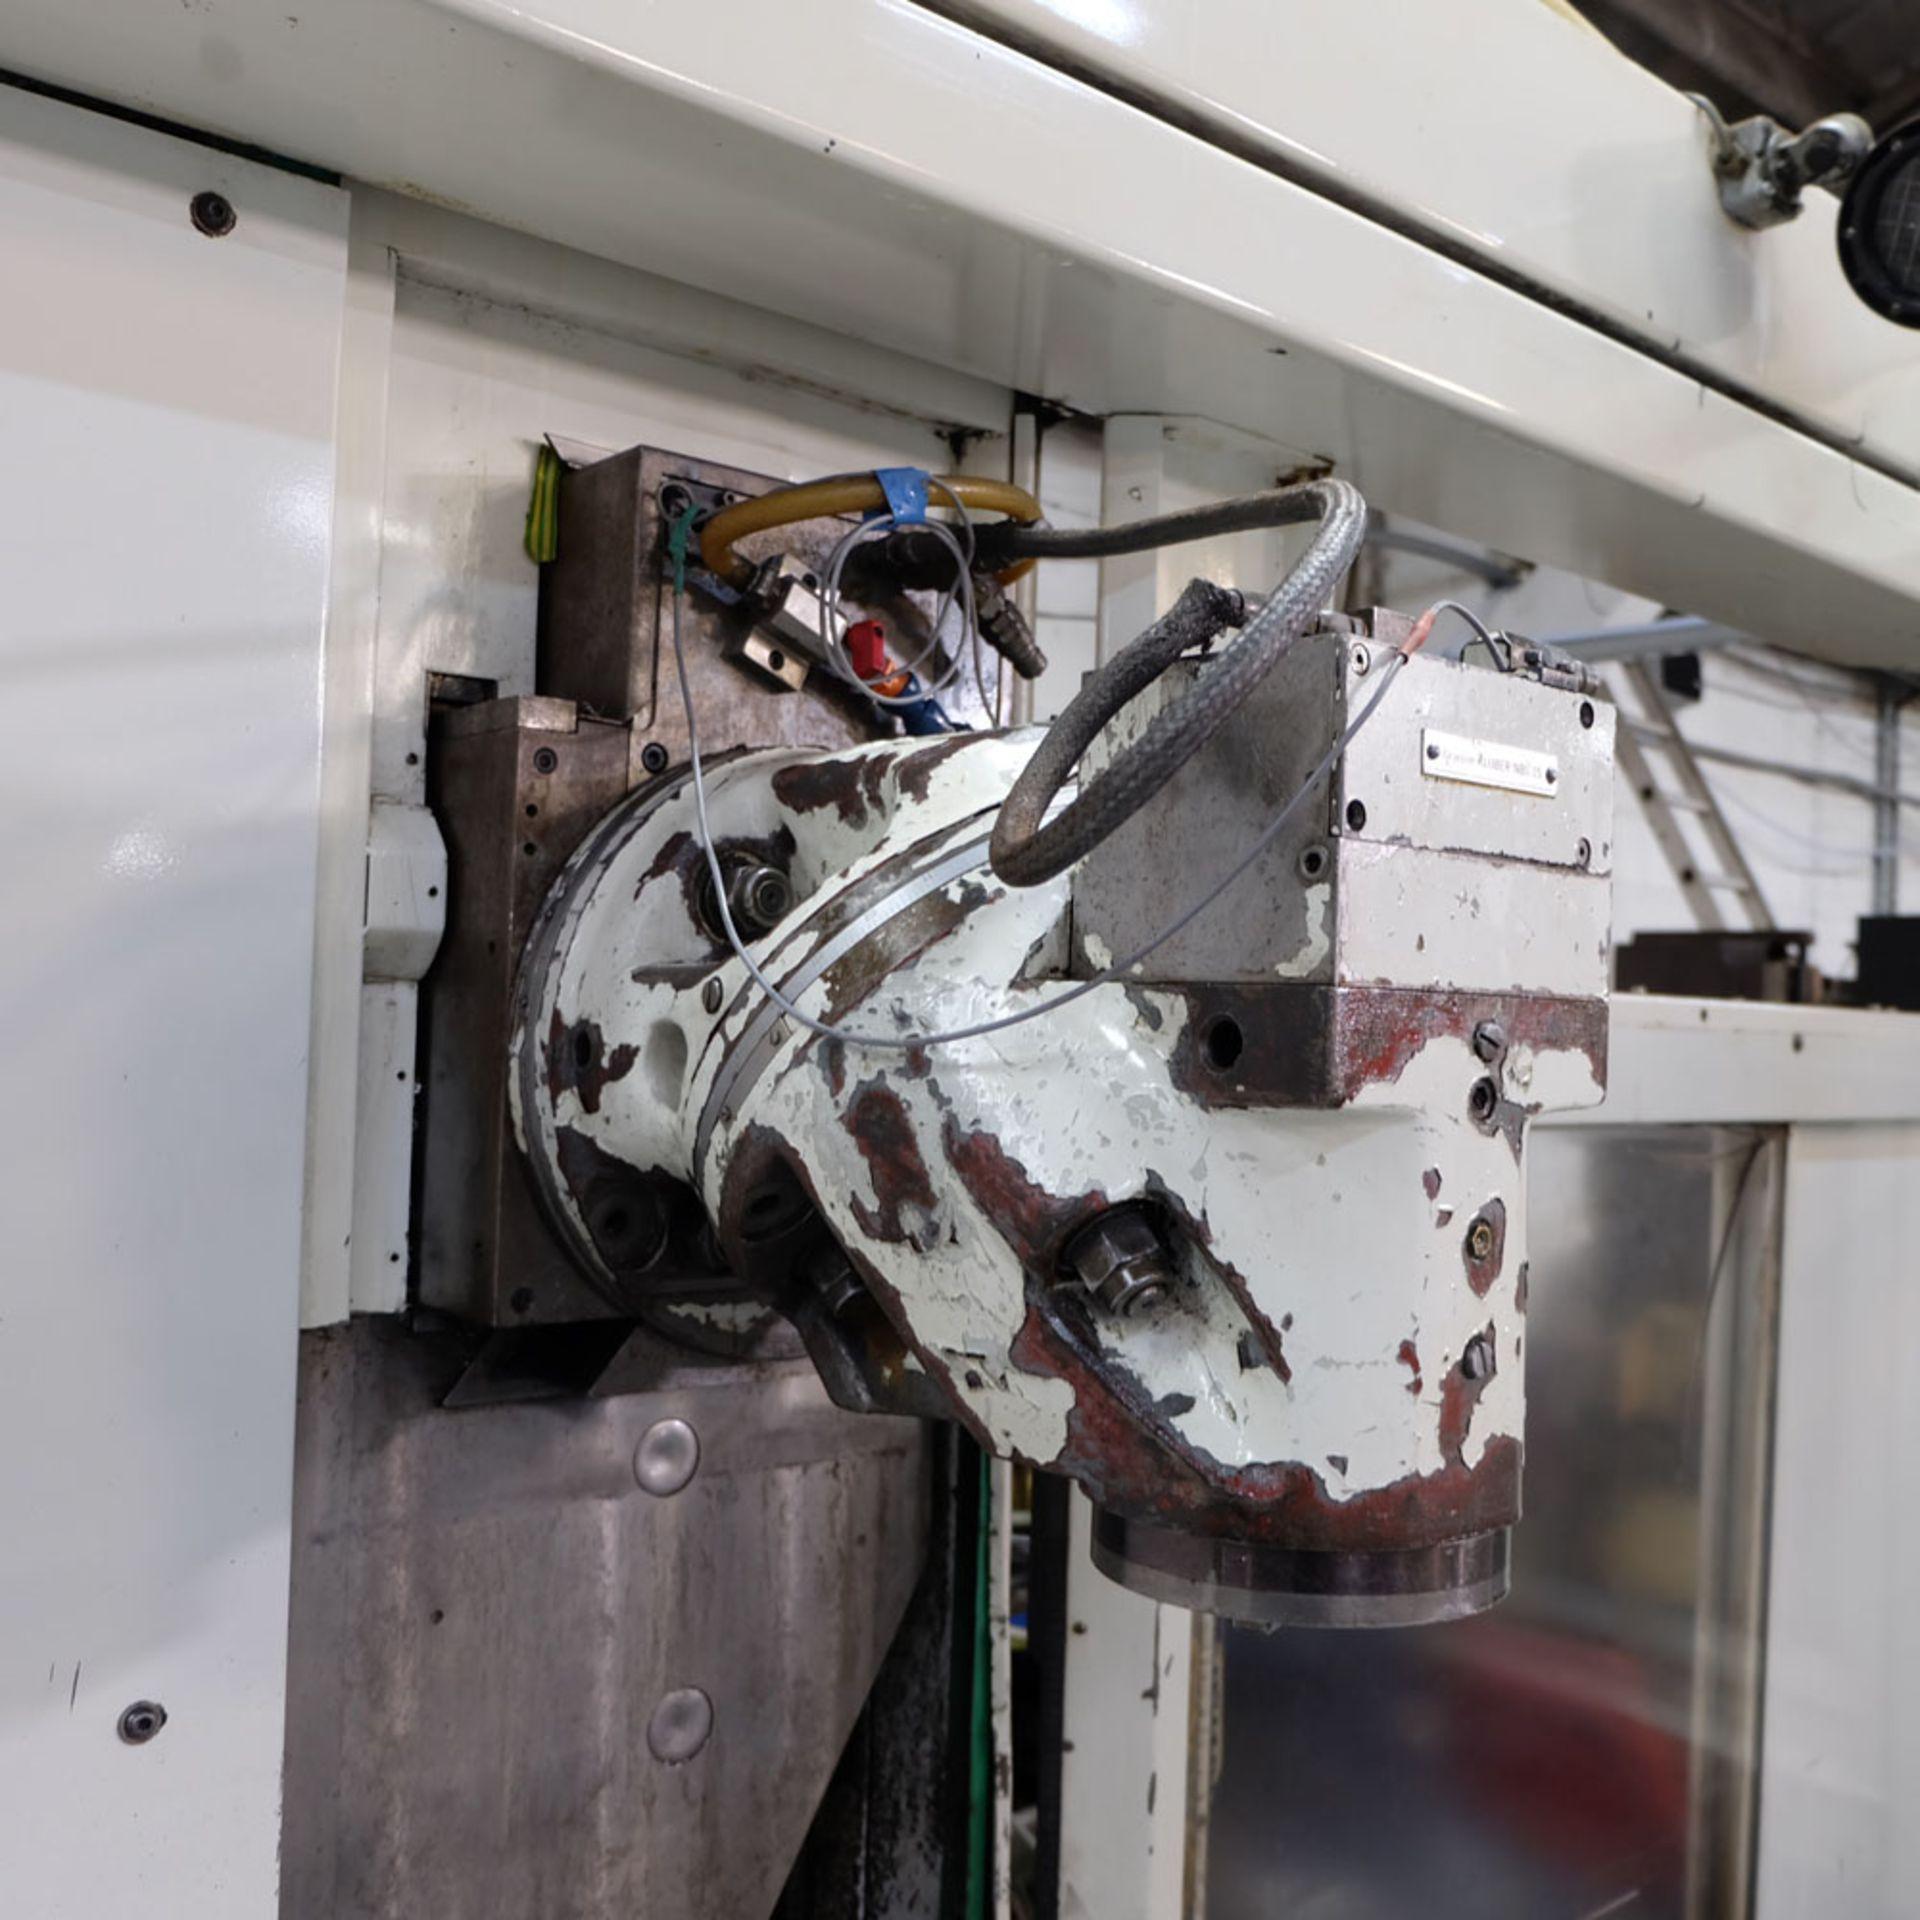 Huron GX 411 F Bed Type Milling Machine. Control Unit: CNC (HEIDENHAIN TNC 415B) - Image 6 of 12